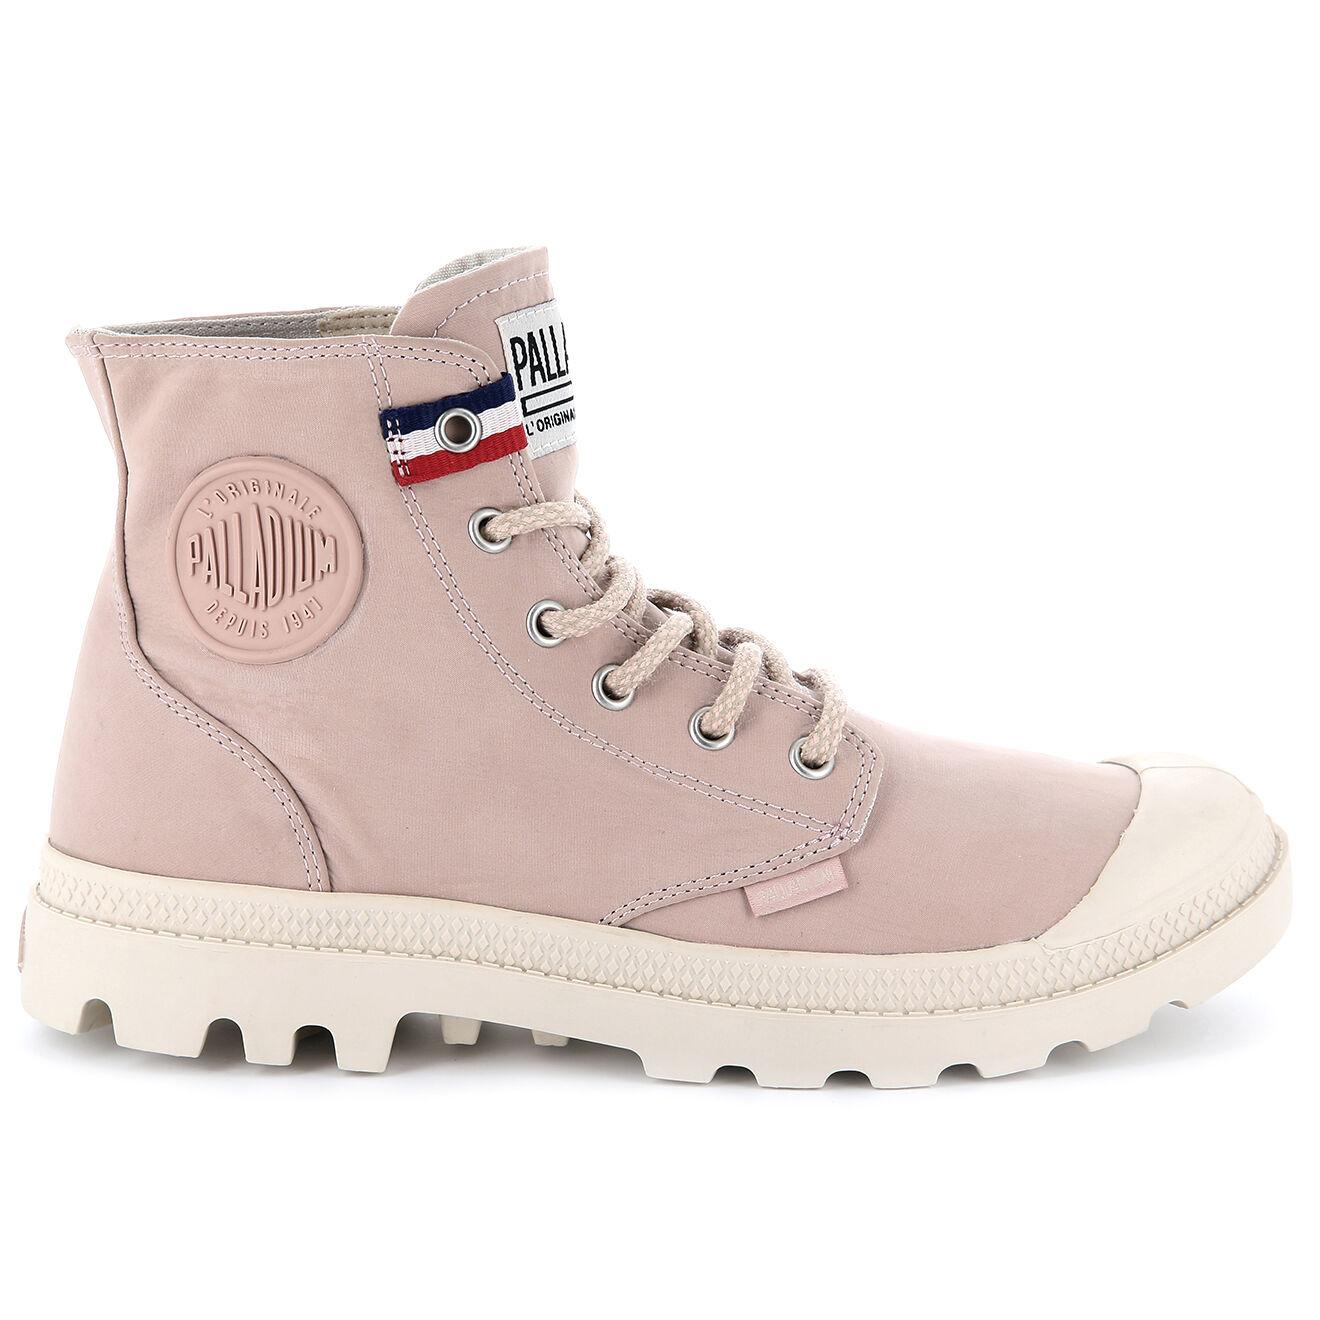 Boots montantes en Toile Pampa Hi rose clair - Palladium - Modalova